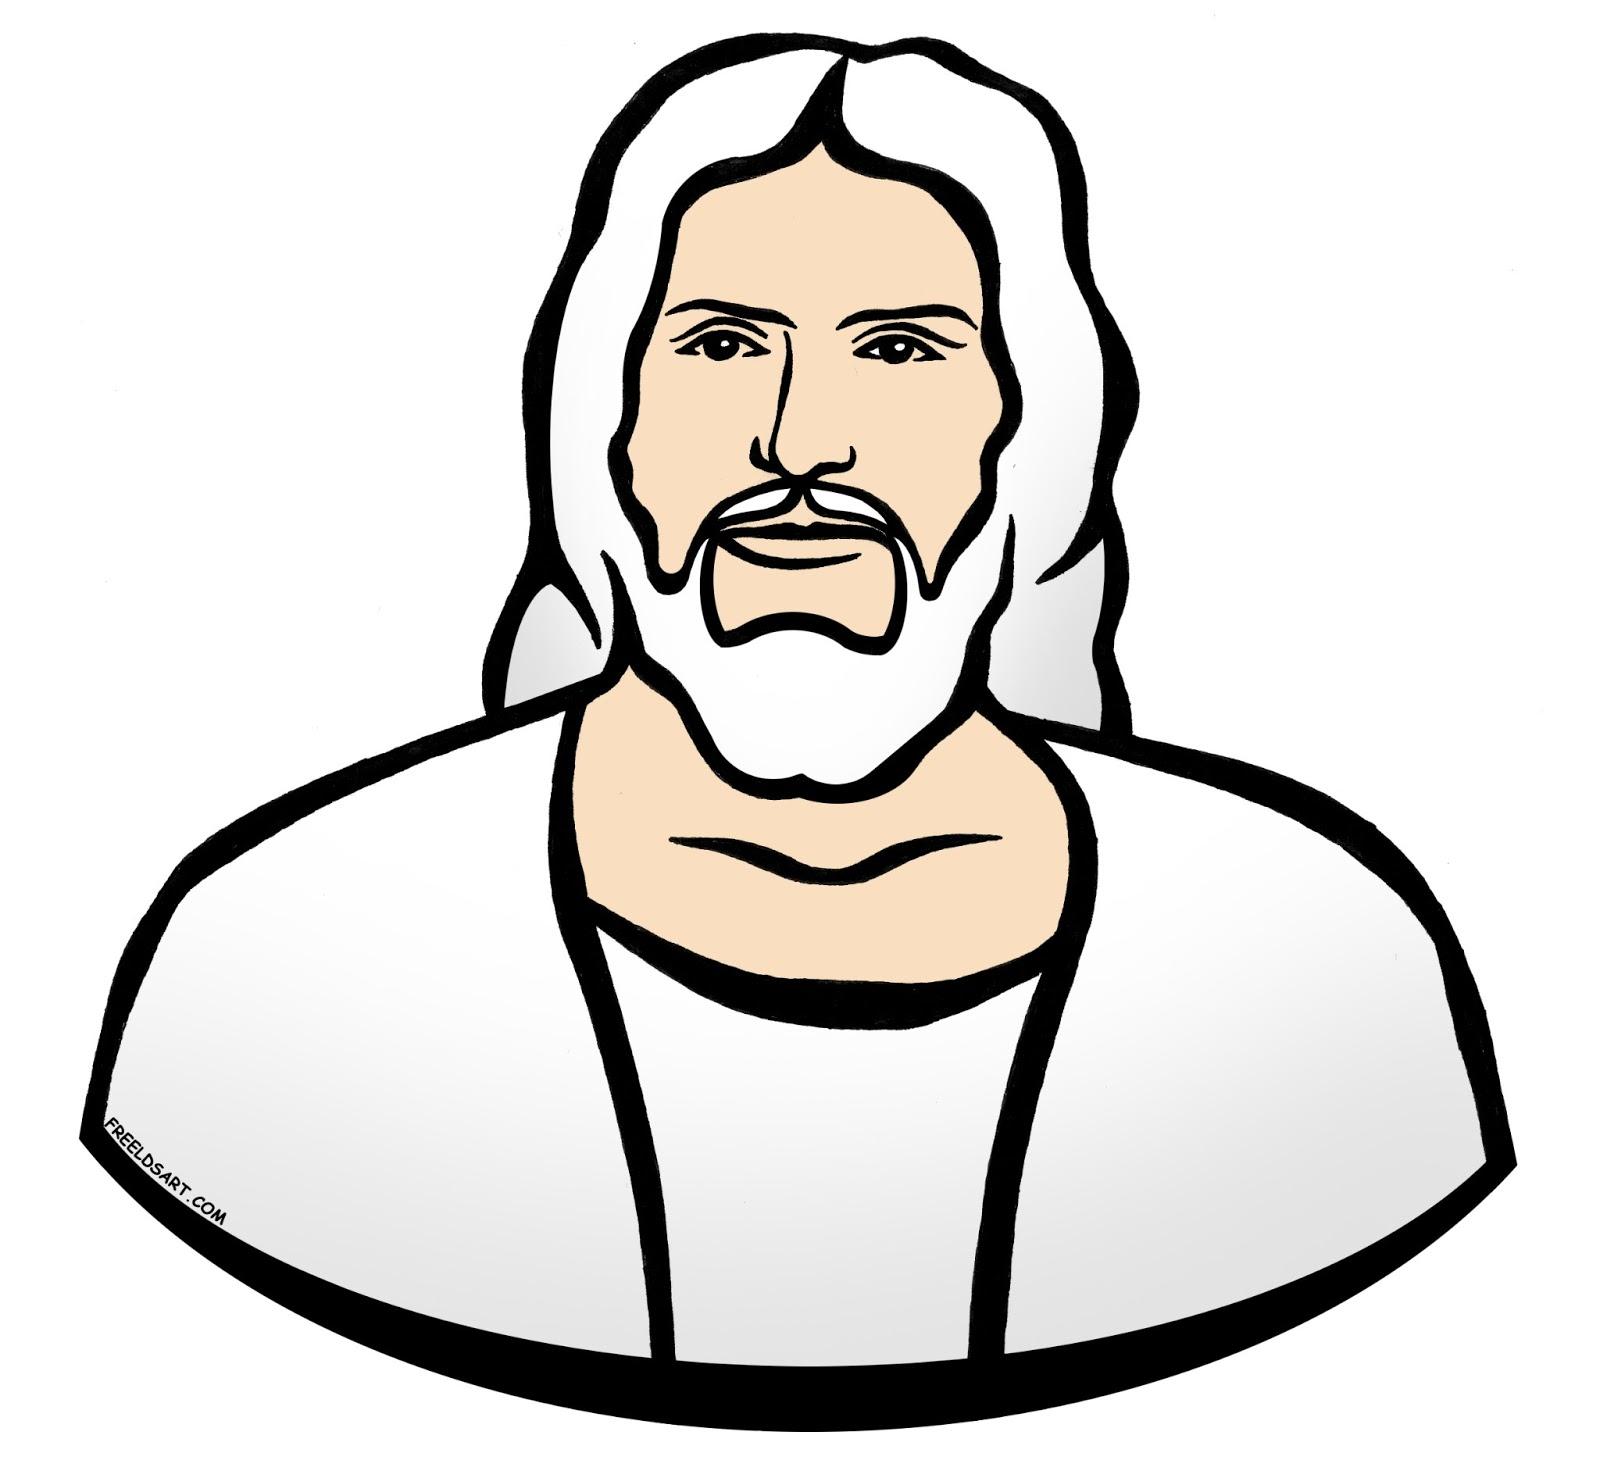 Clip Art Jesus - Clipart Library-Clip Art Jesus - Clipart library-2